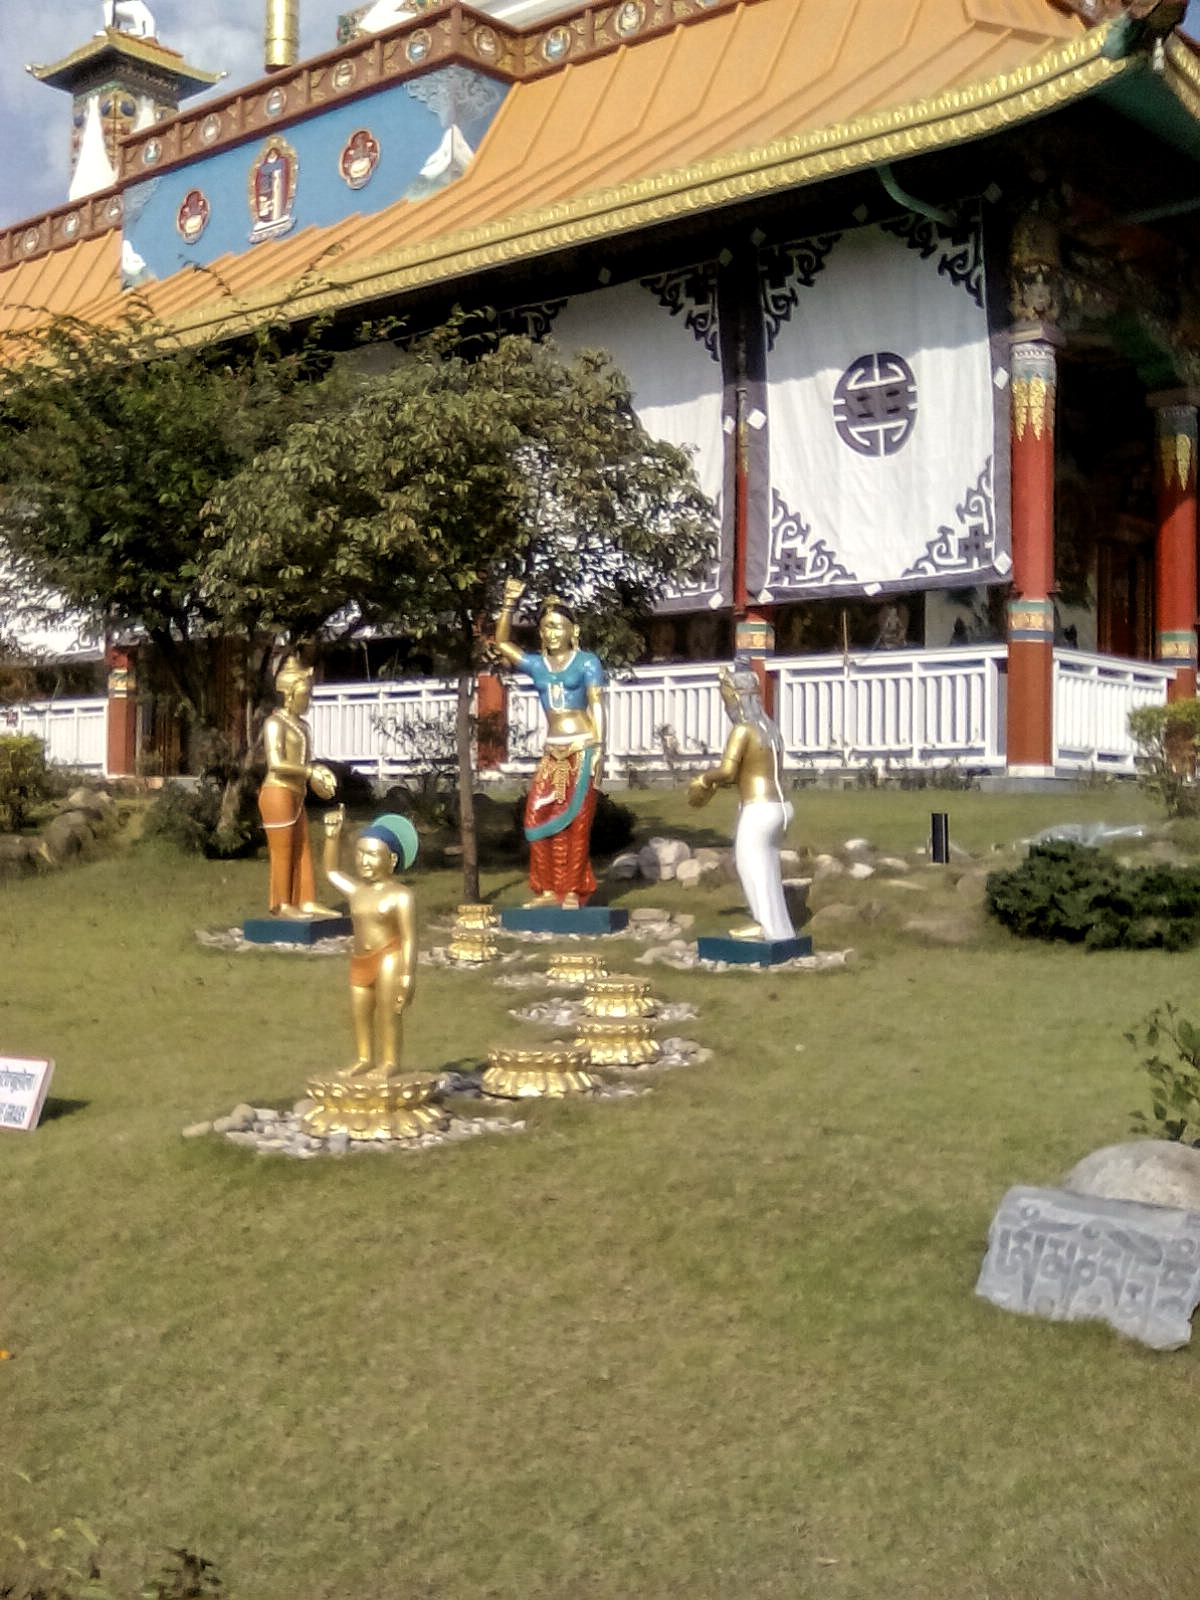 bouddha statues lumbini nepal voyage travel